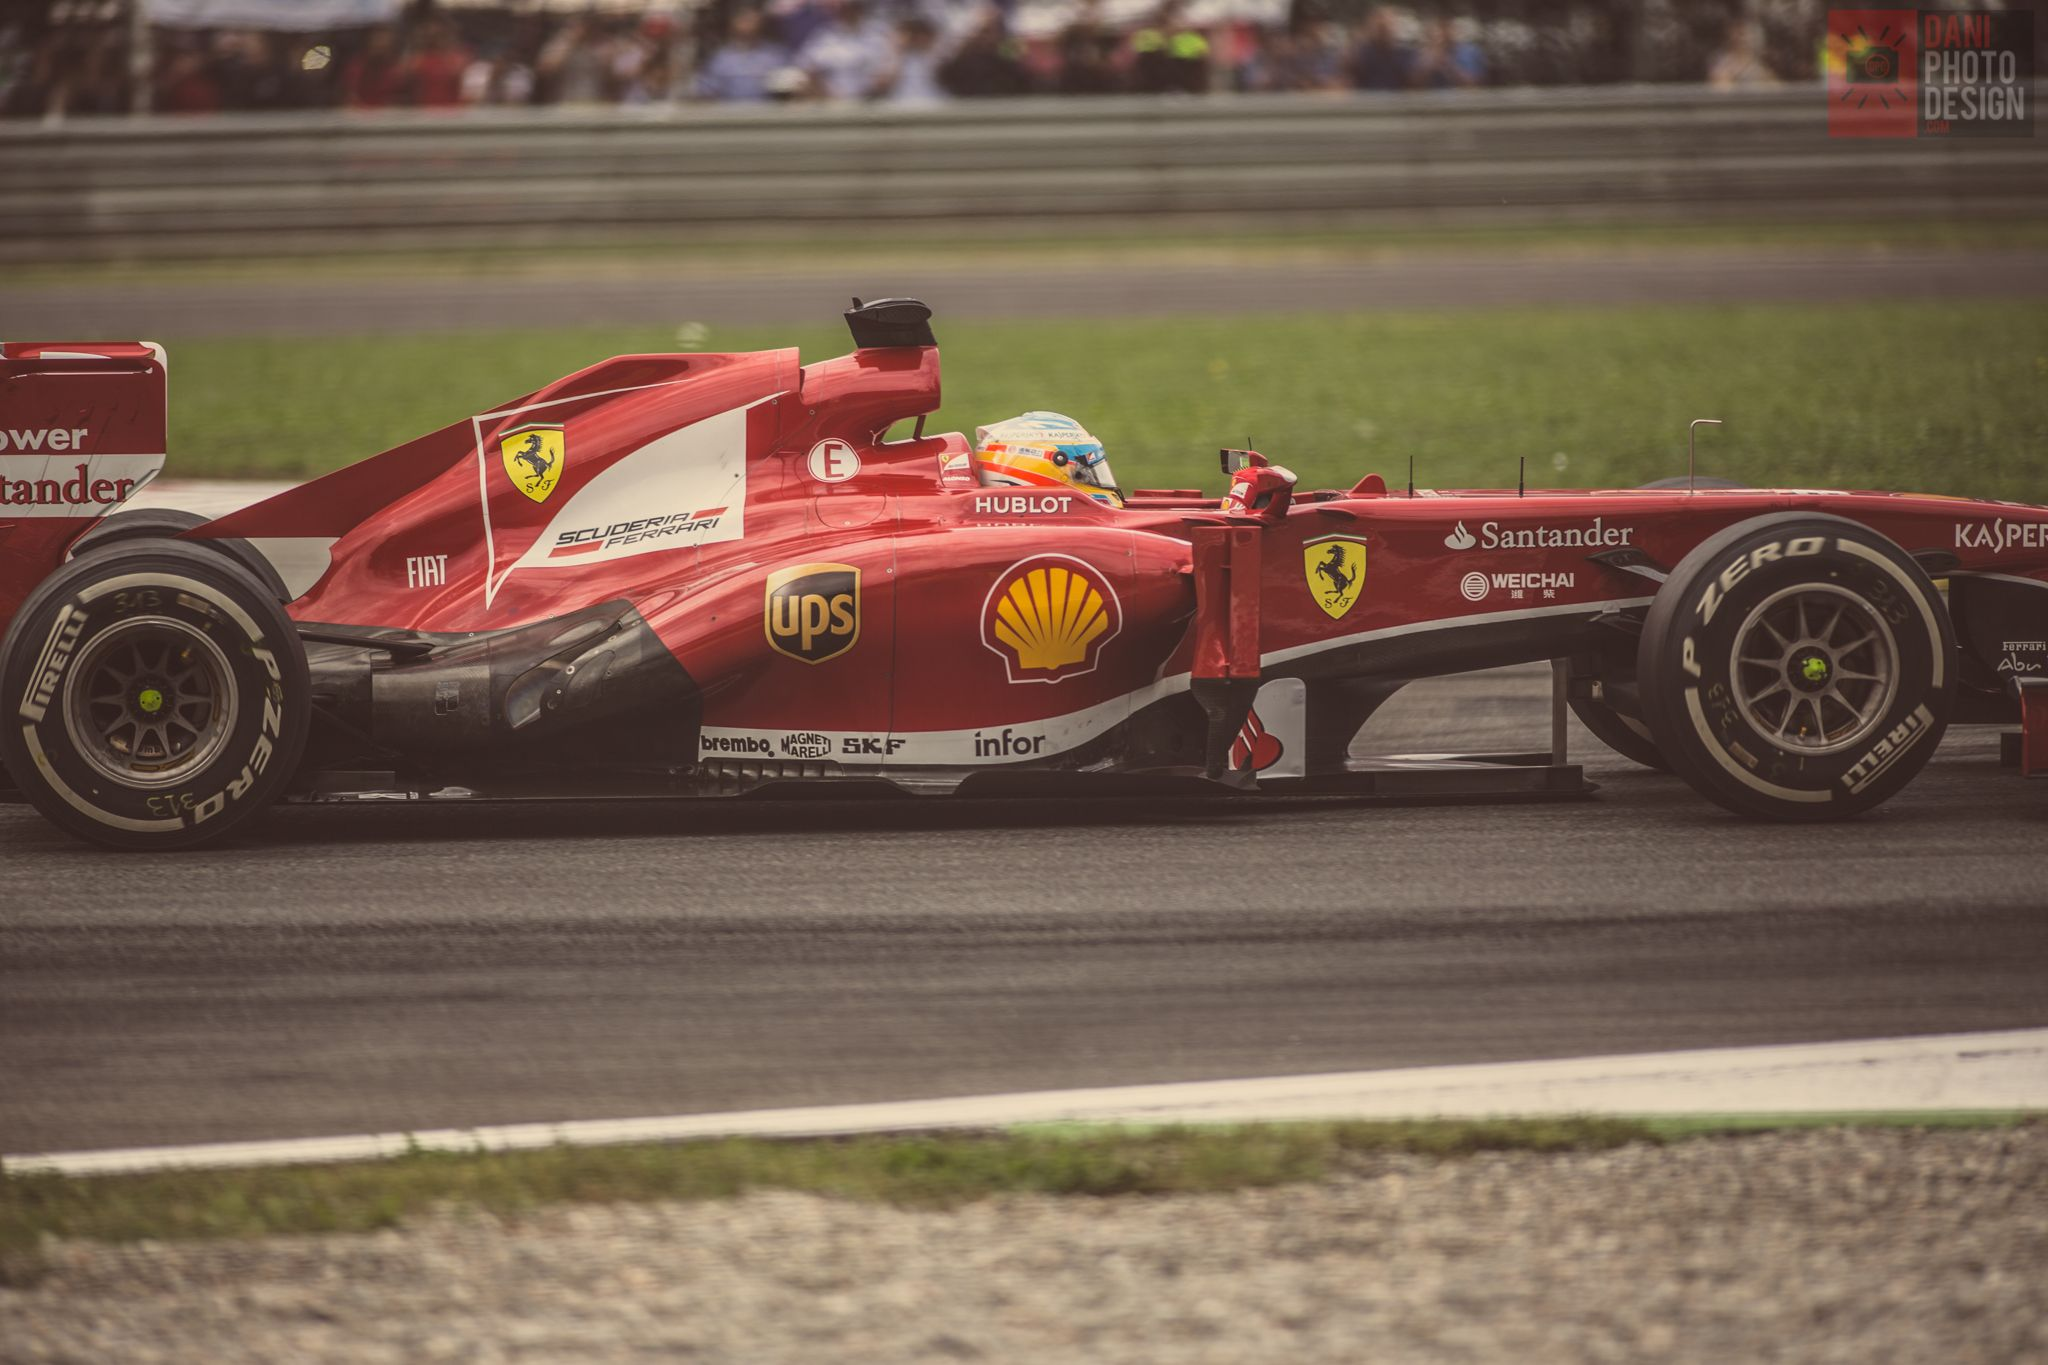 Formula 1 - Fernando Alonso - Ferrari - GP Monza - daniphotodesign.com